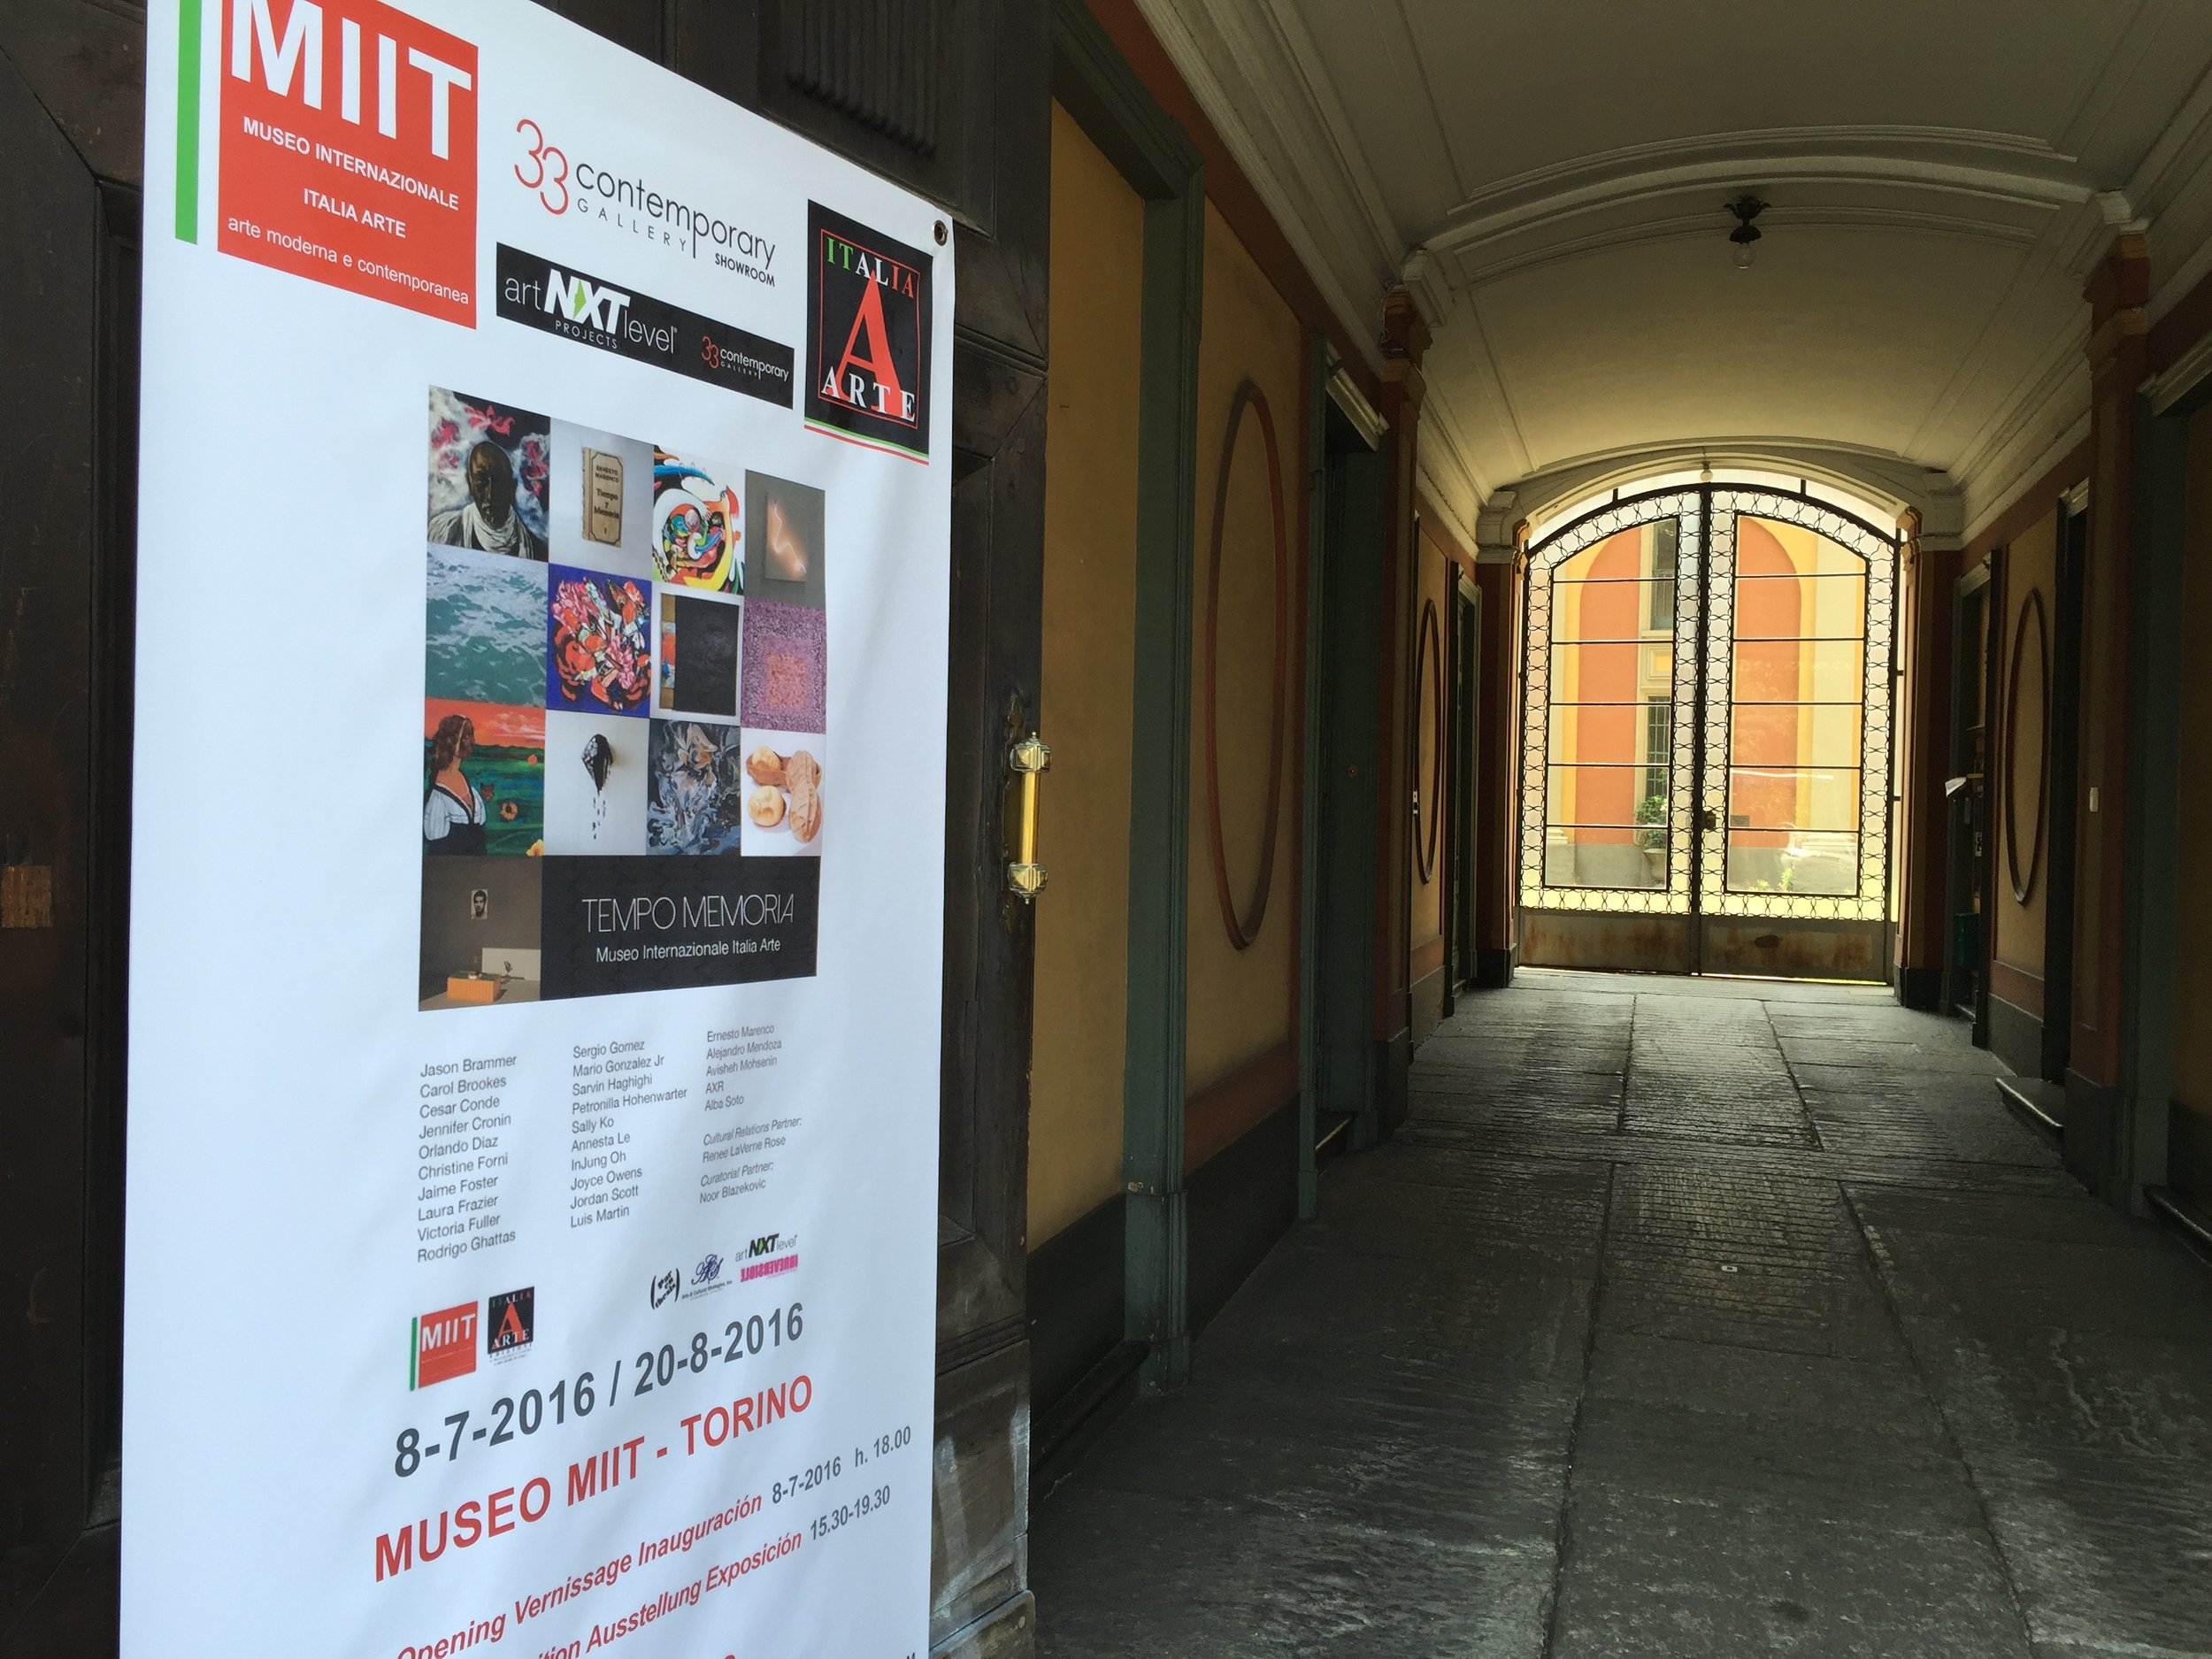 The Museum MIIT